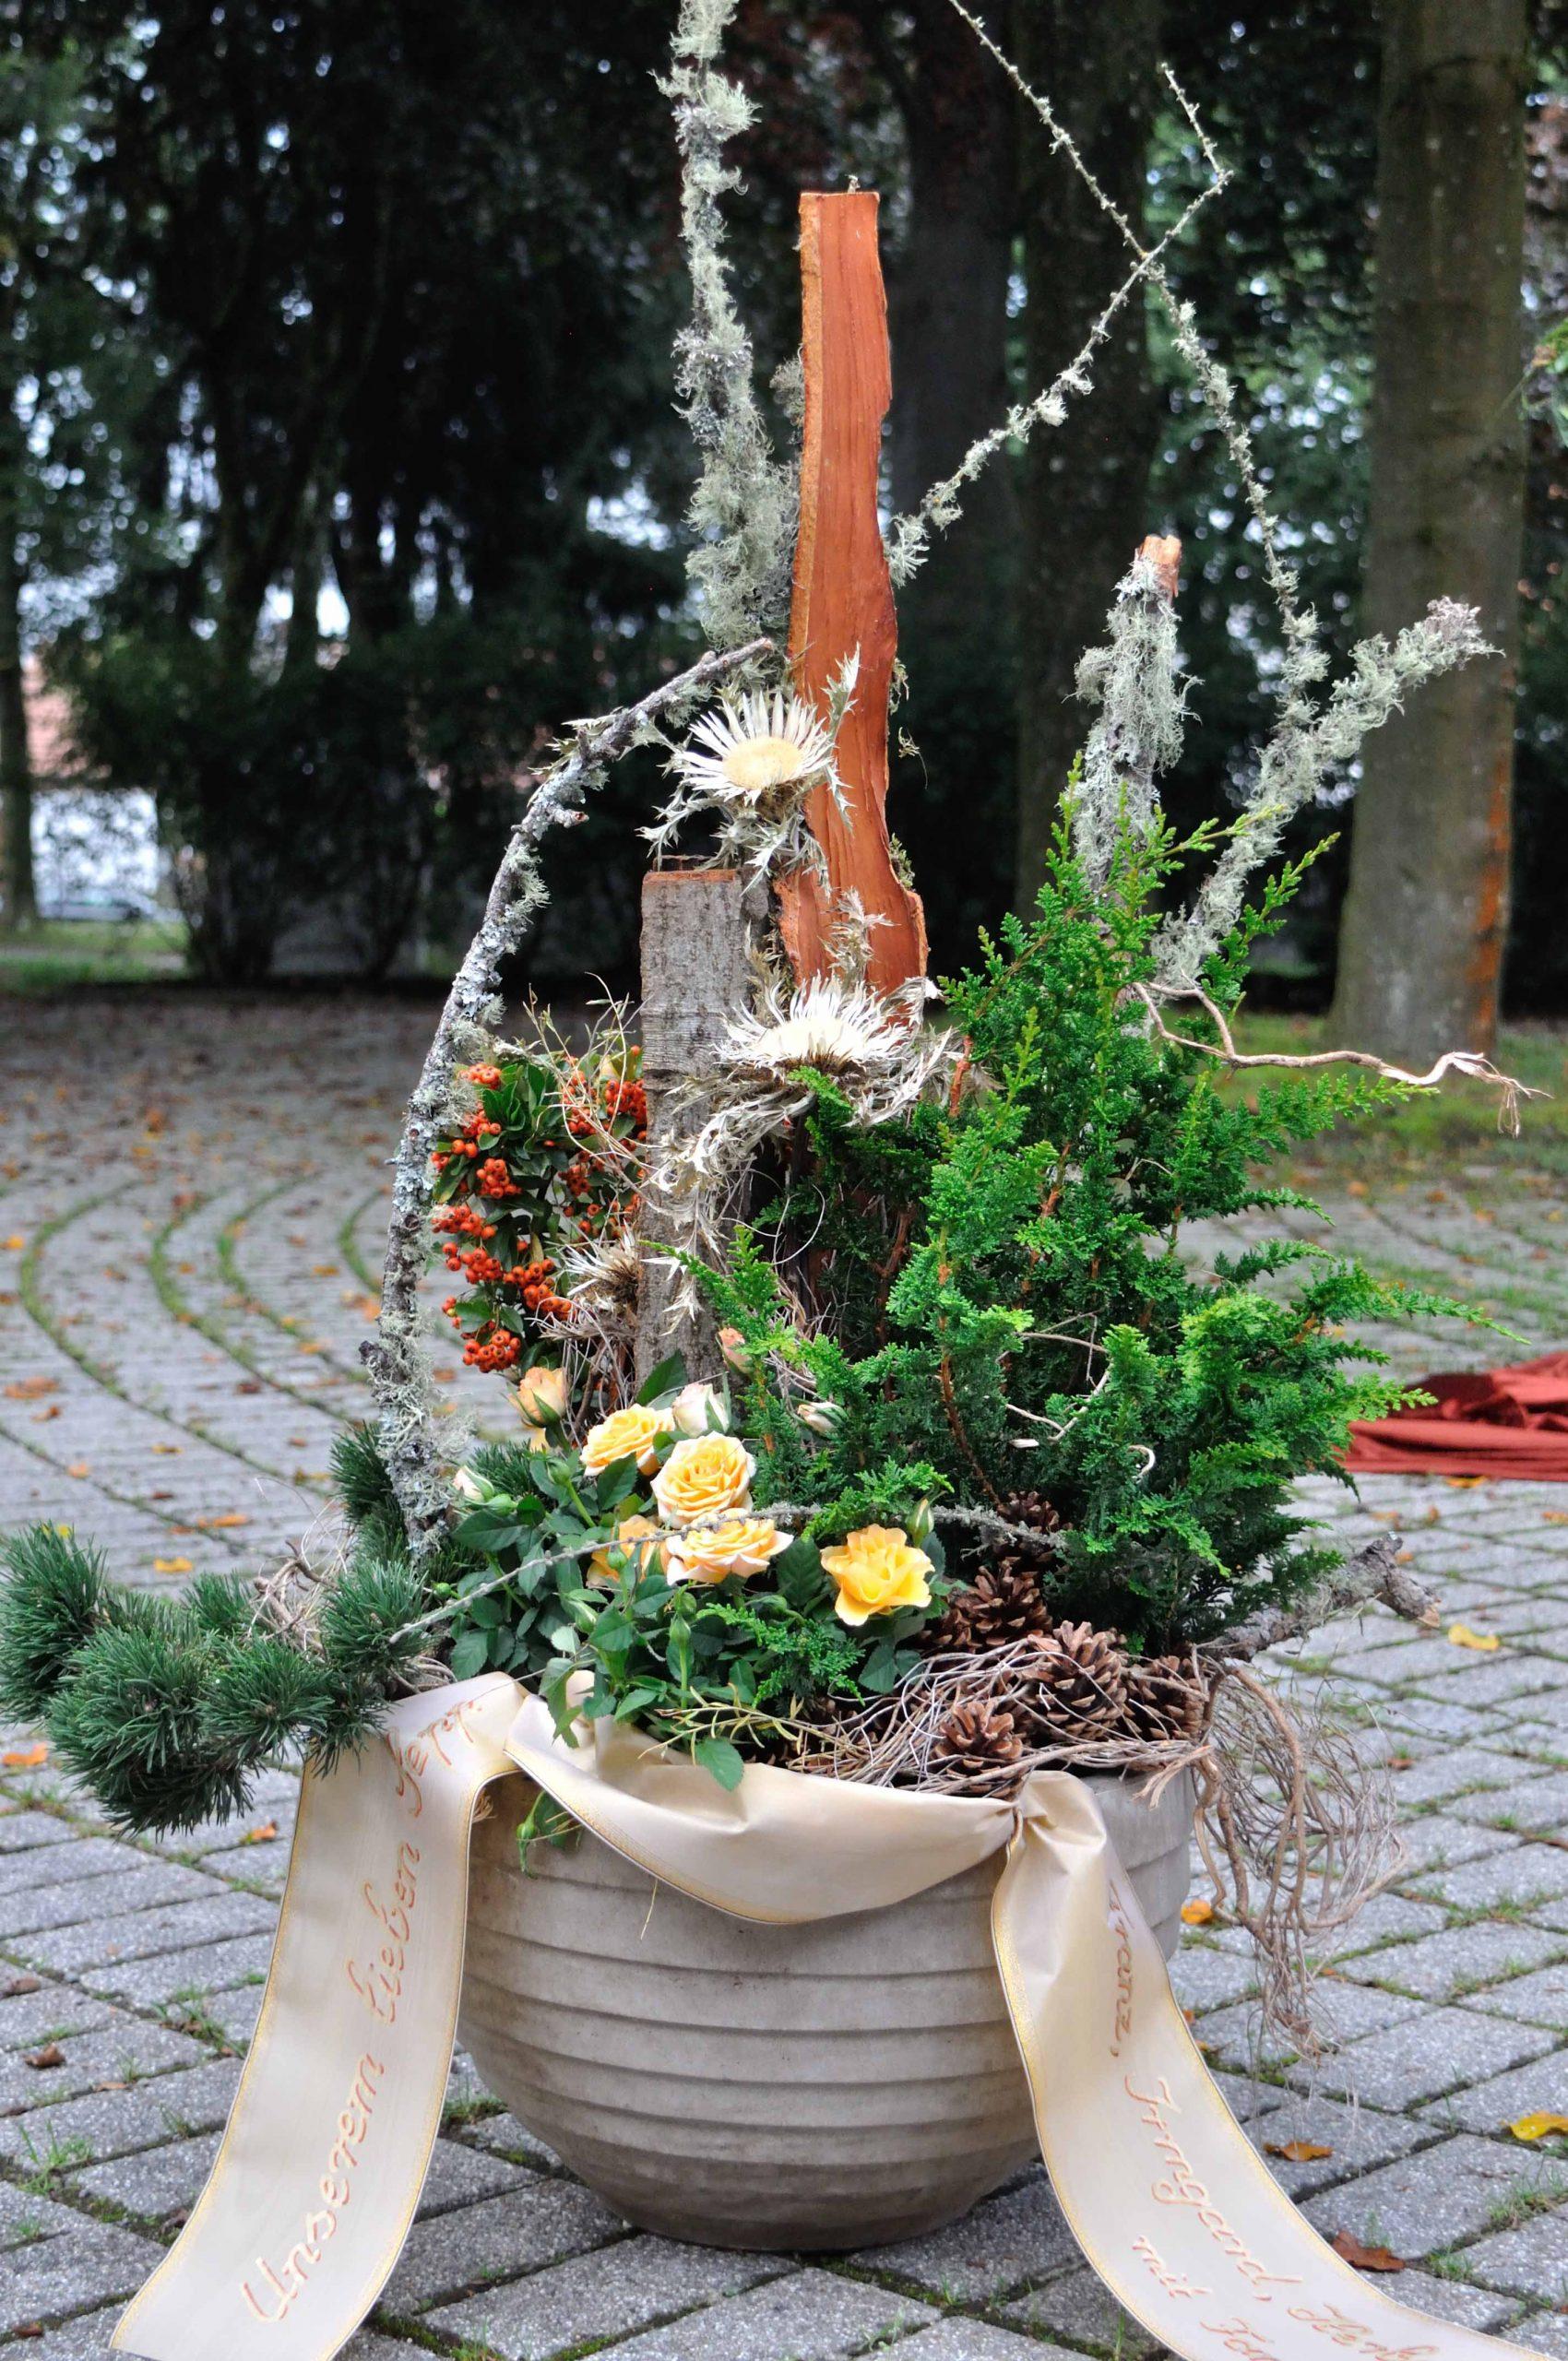 43 Keramik-Pflanzschale haltbar bepflanzt